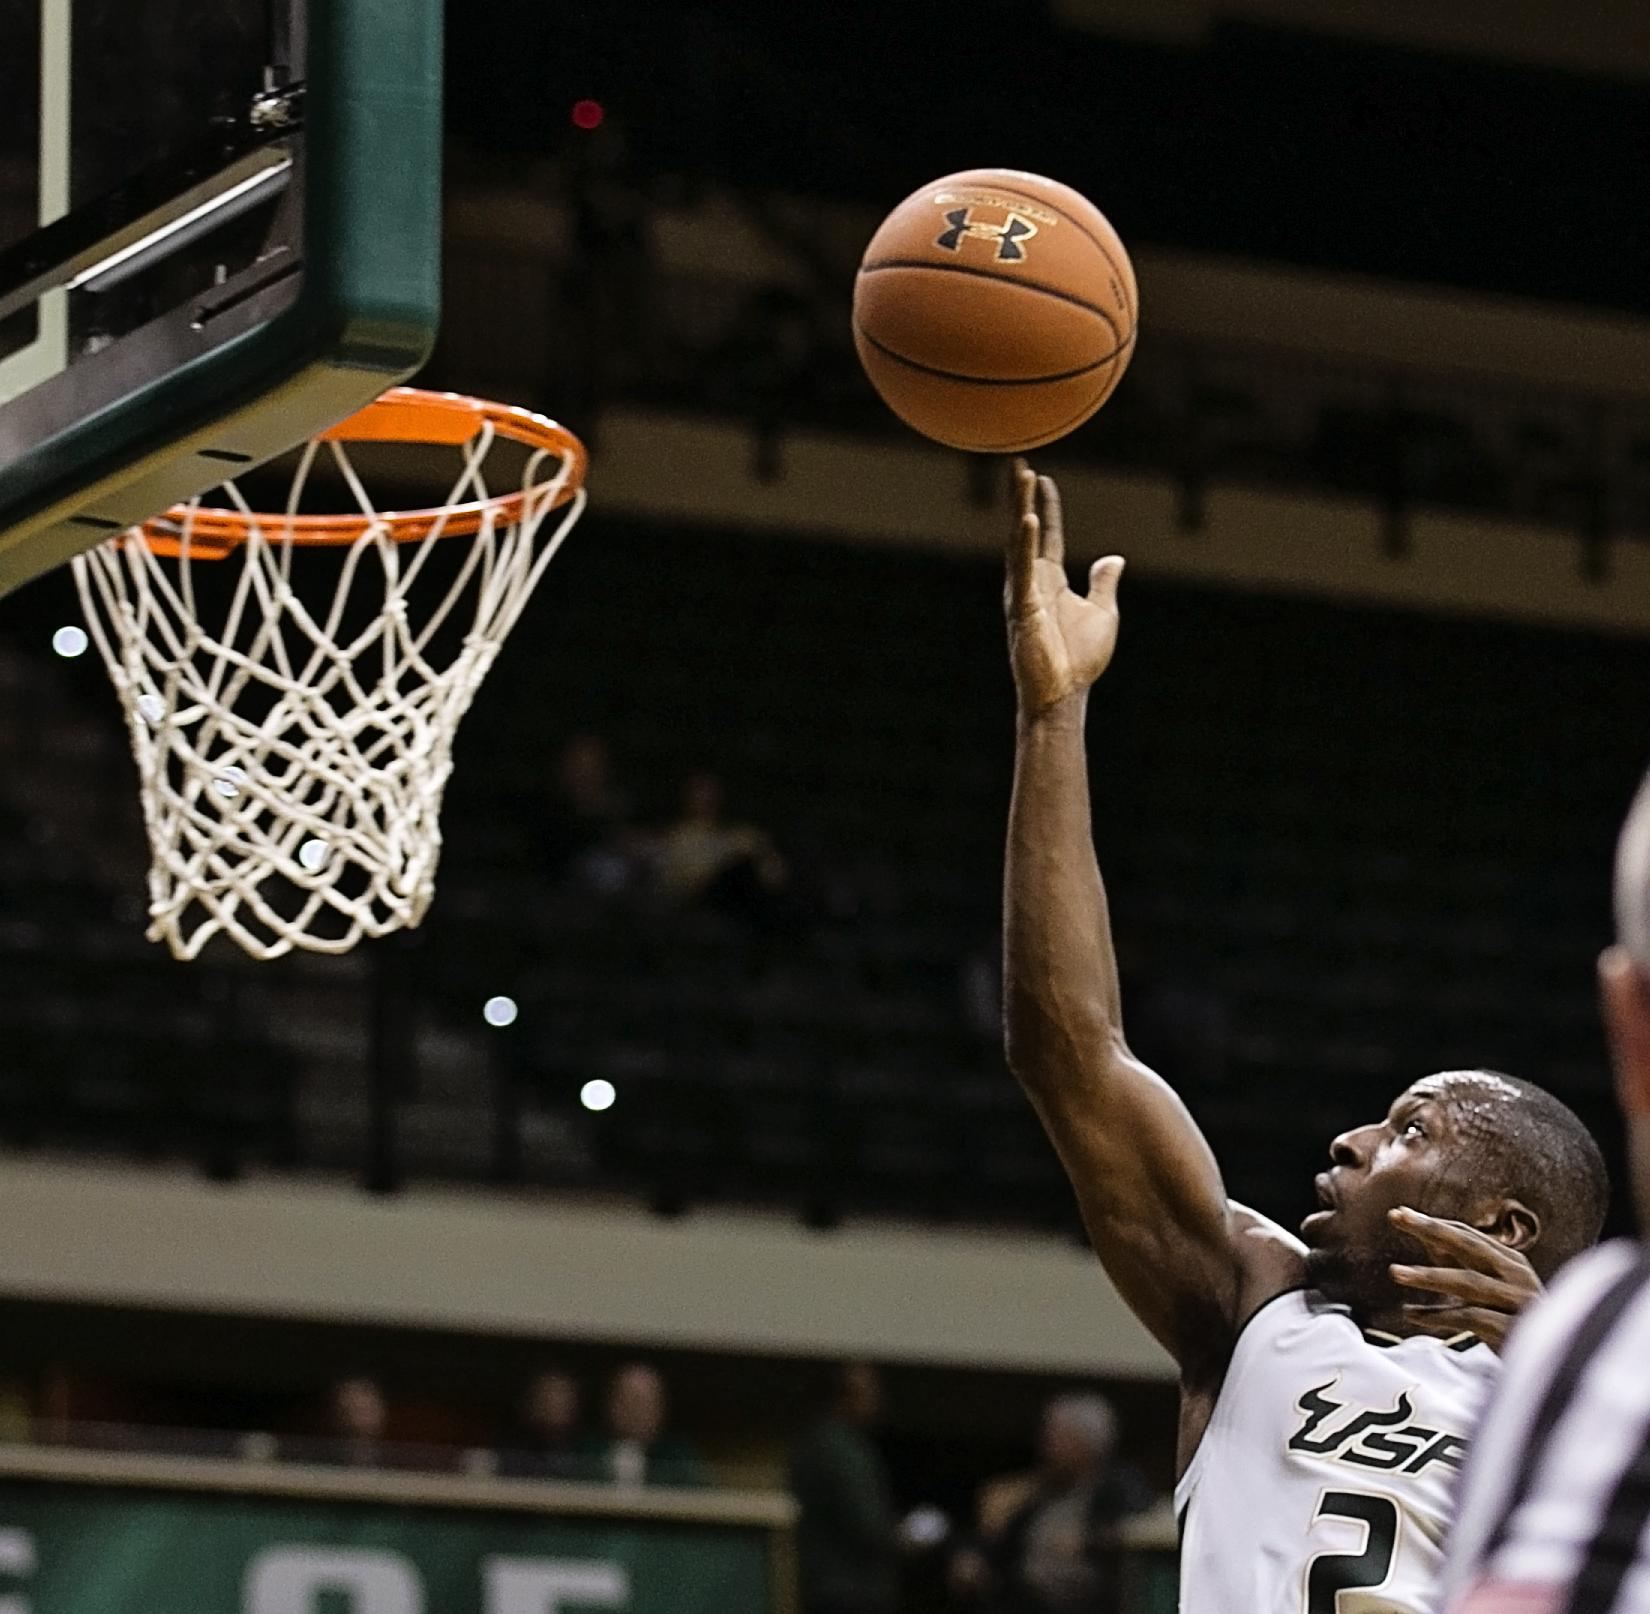 Terrence Samual lays in a basket for the Bulls./CARMEN MANDATO